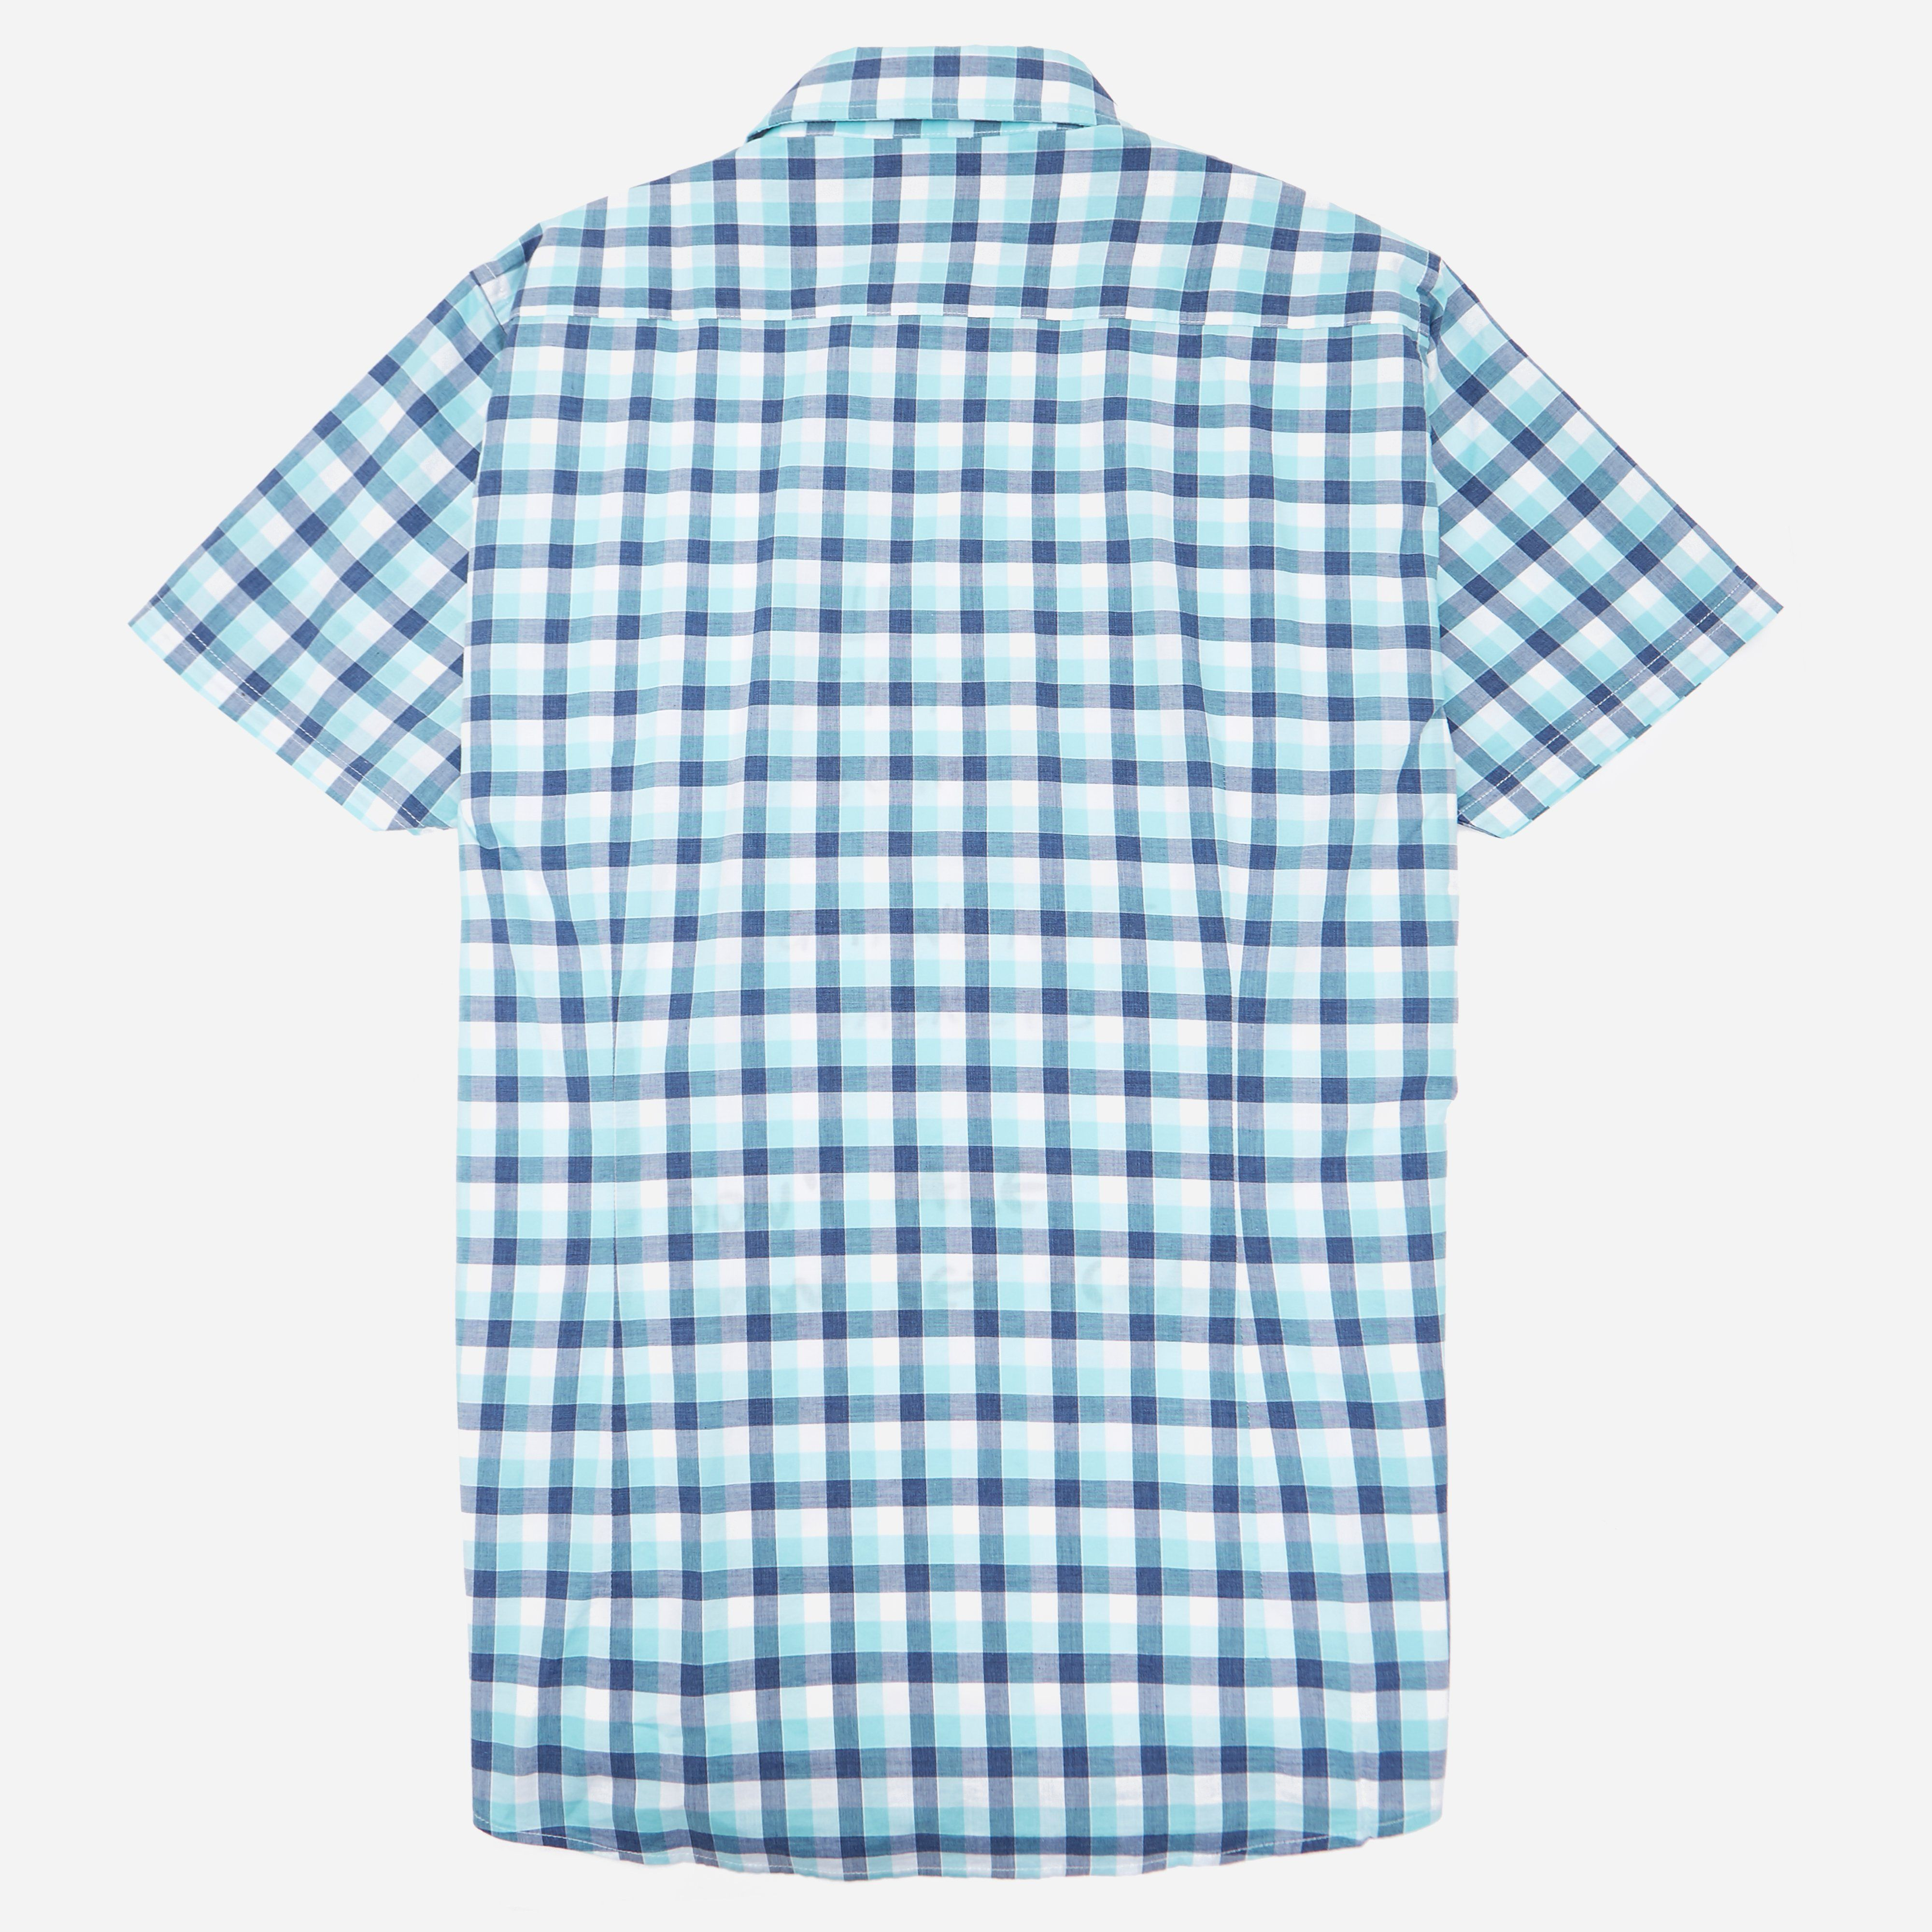 Barbour Barge Short Sleeve Shirt